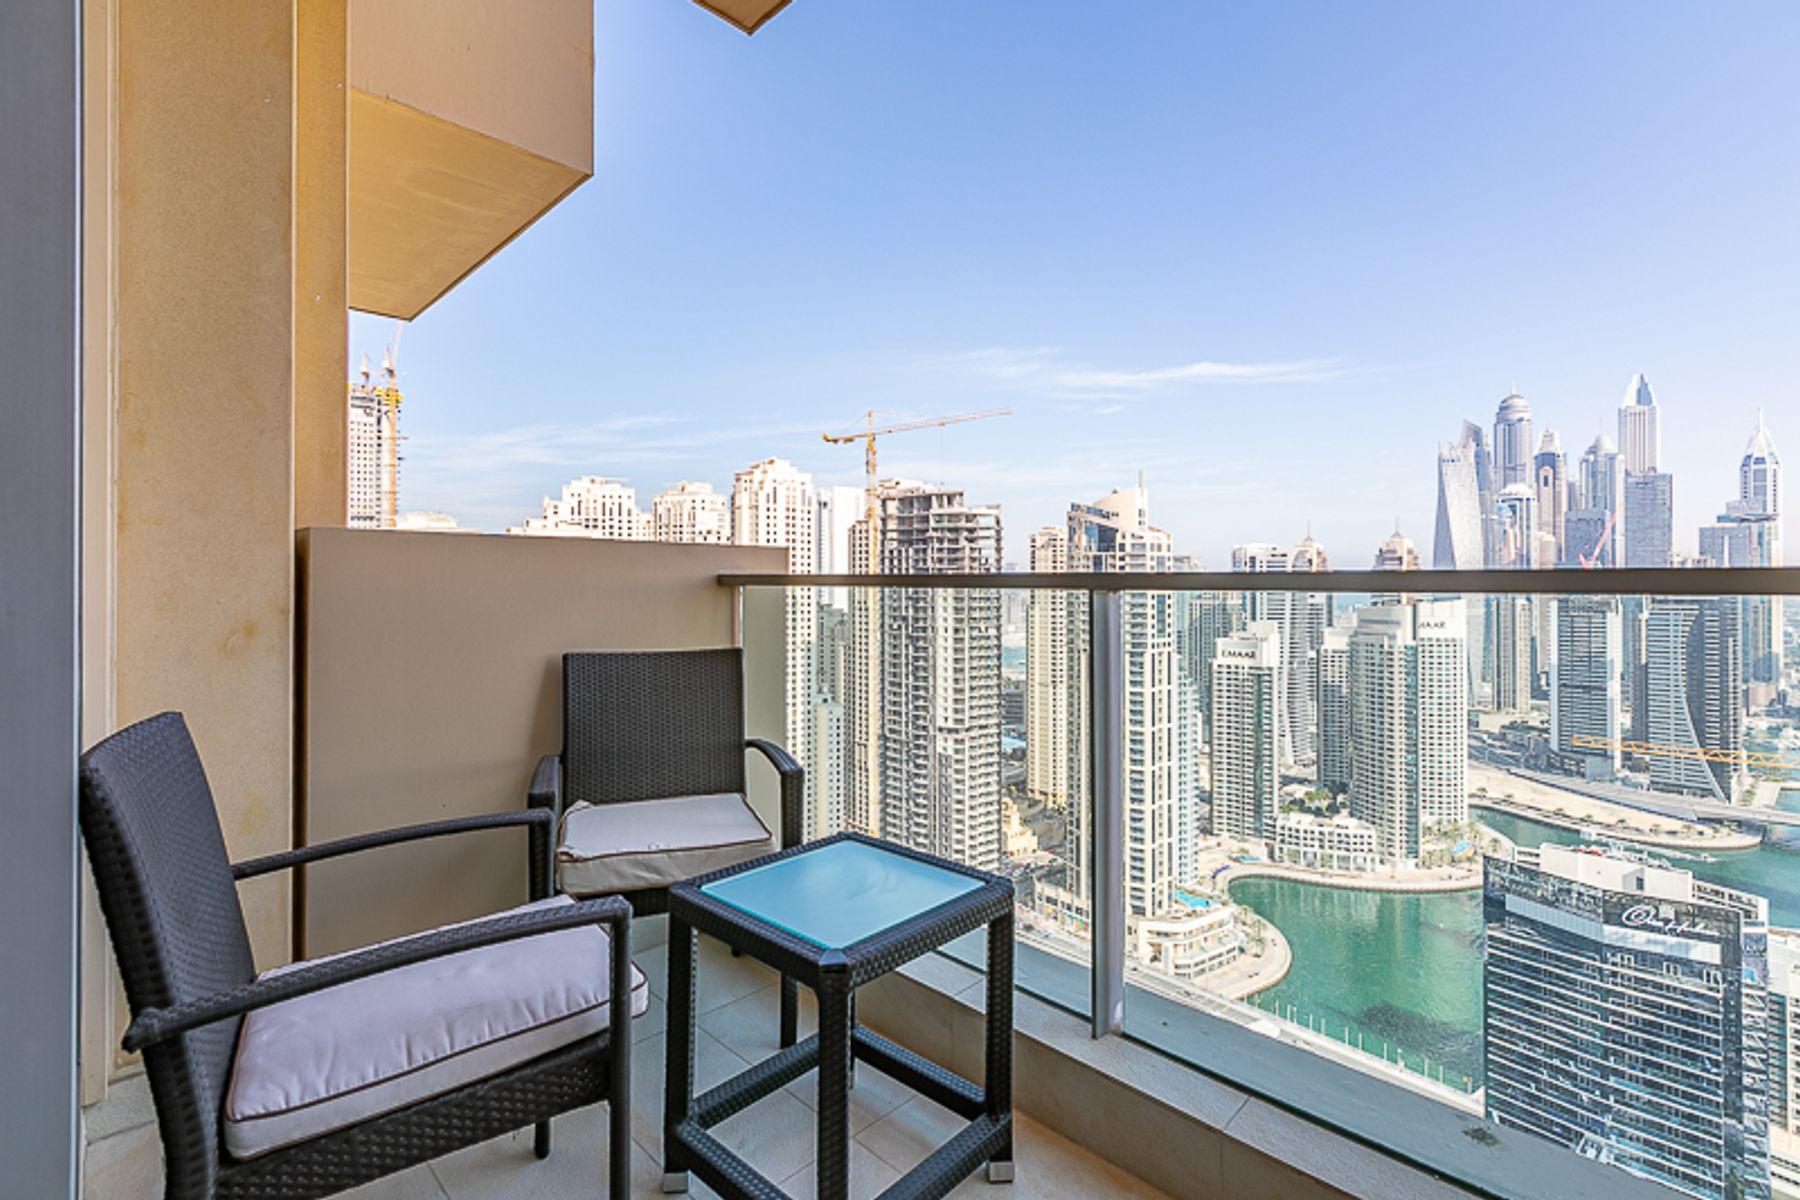 Studio for Sale in The Address Dubai Marina - Dubai Marina